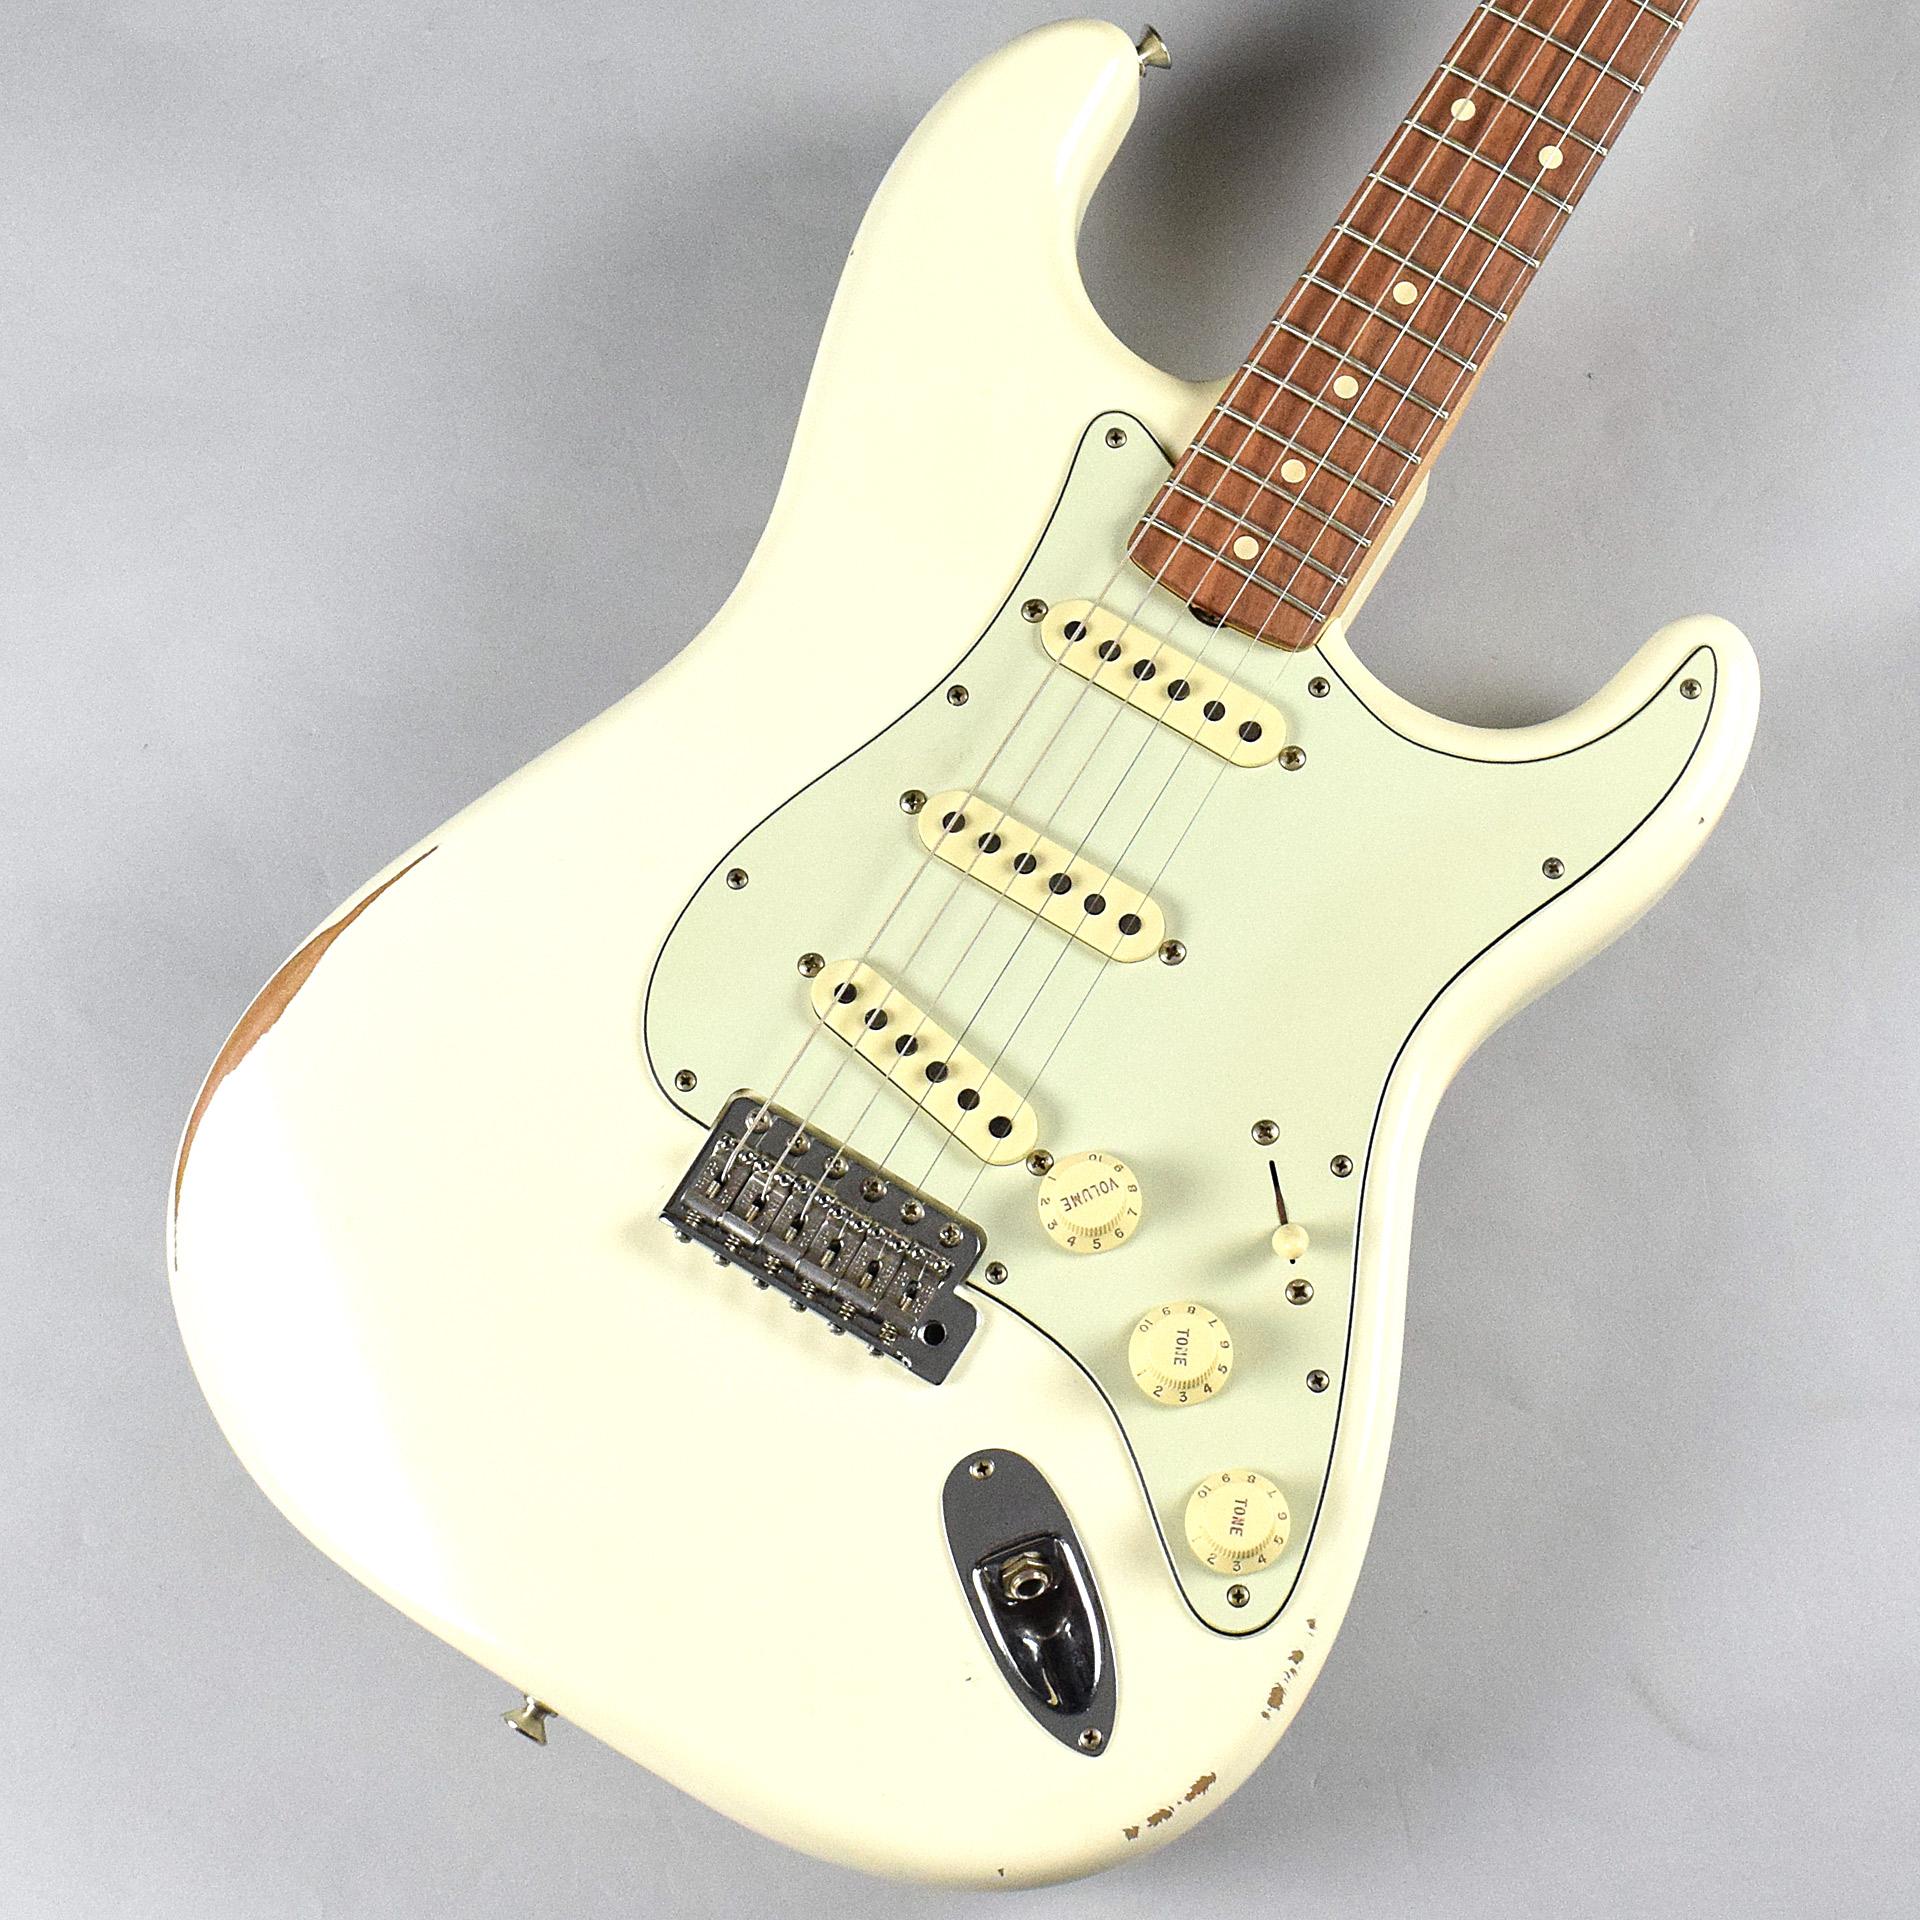 Road Worn '60s Stratocaster PF